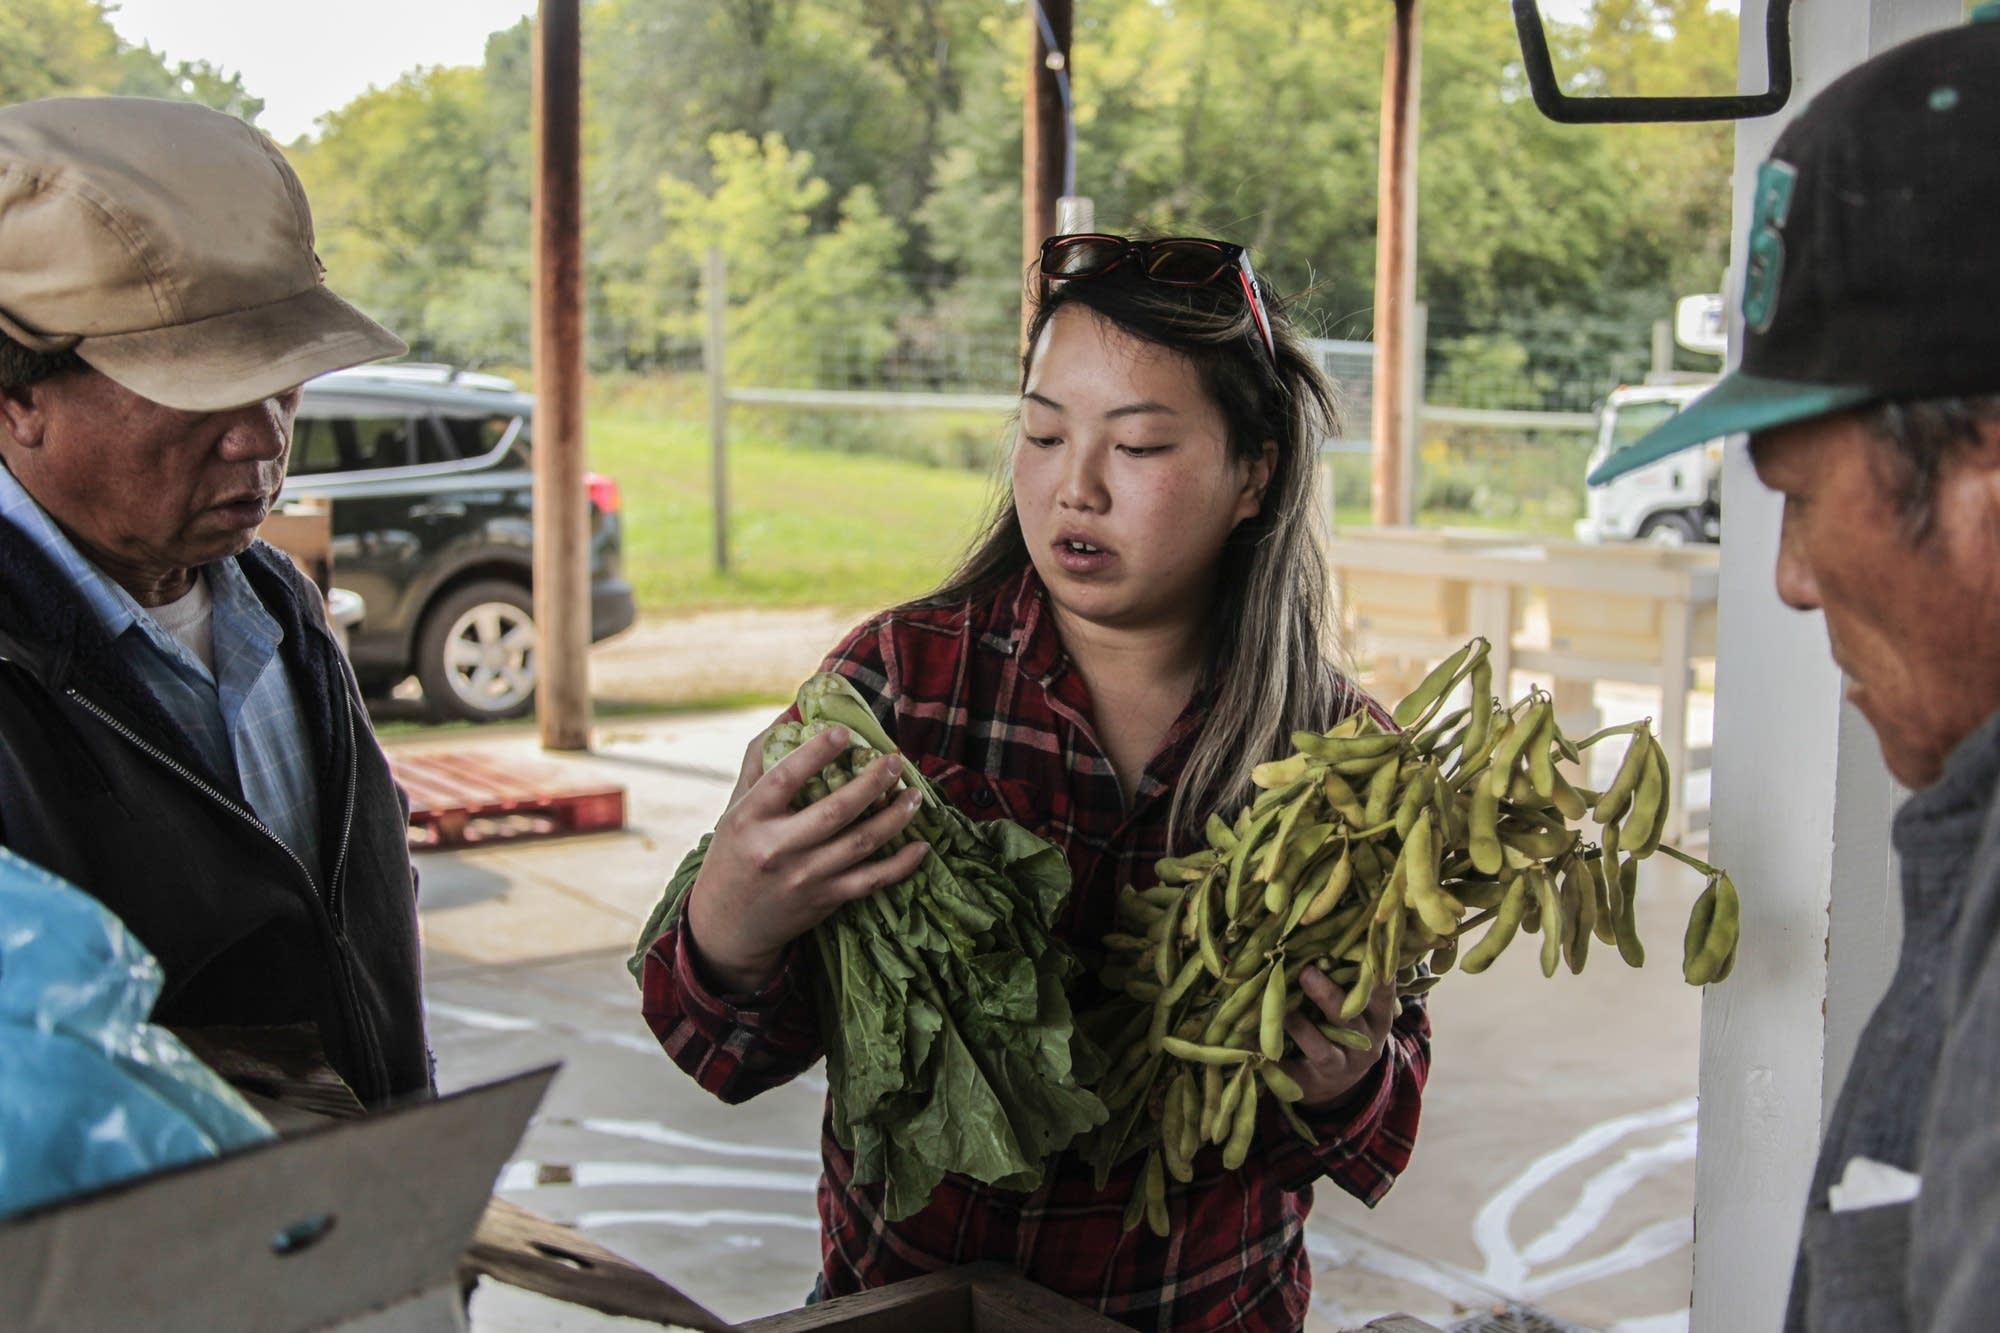 Food hub director speaks to the Hmong farmers at Hafa Farms.